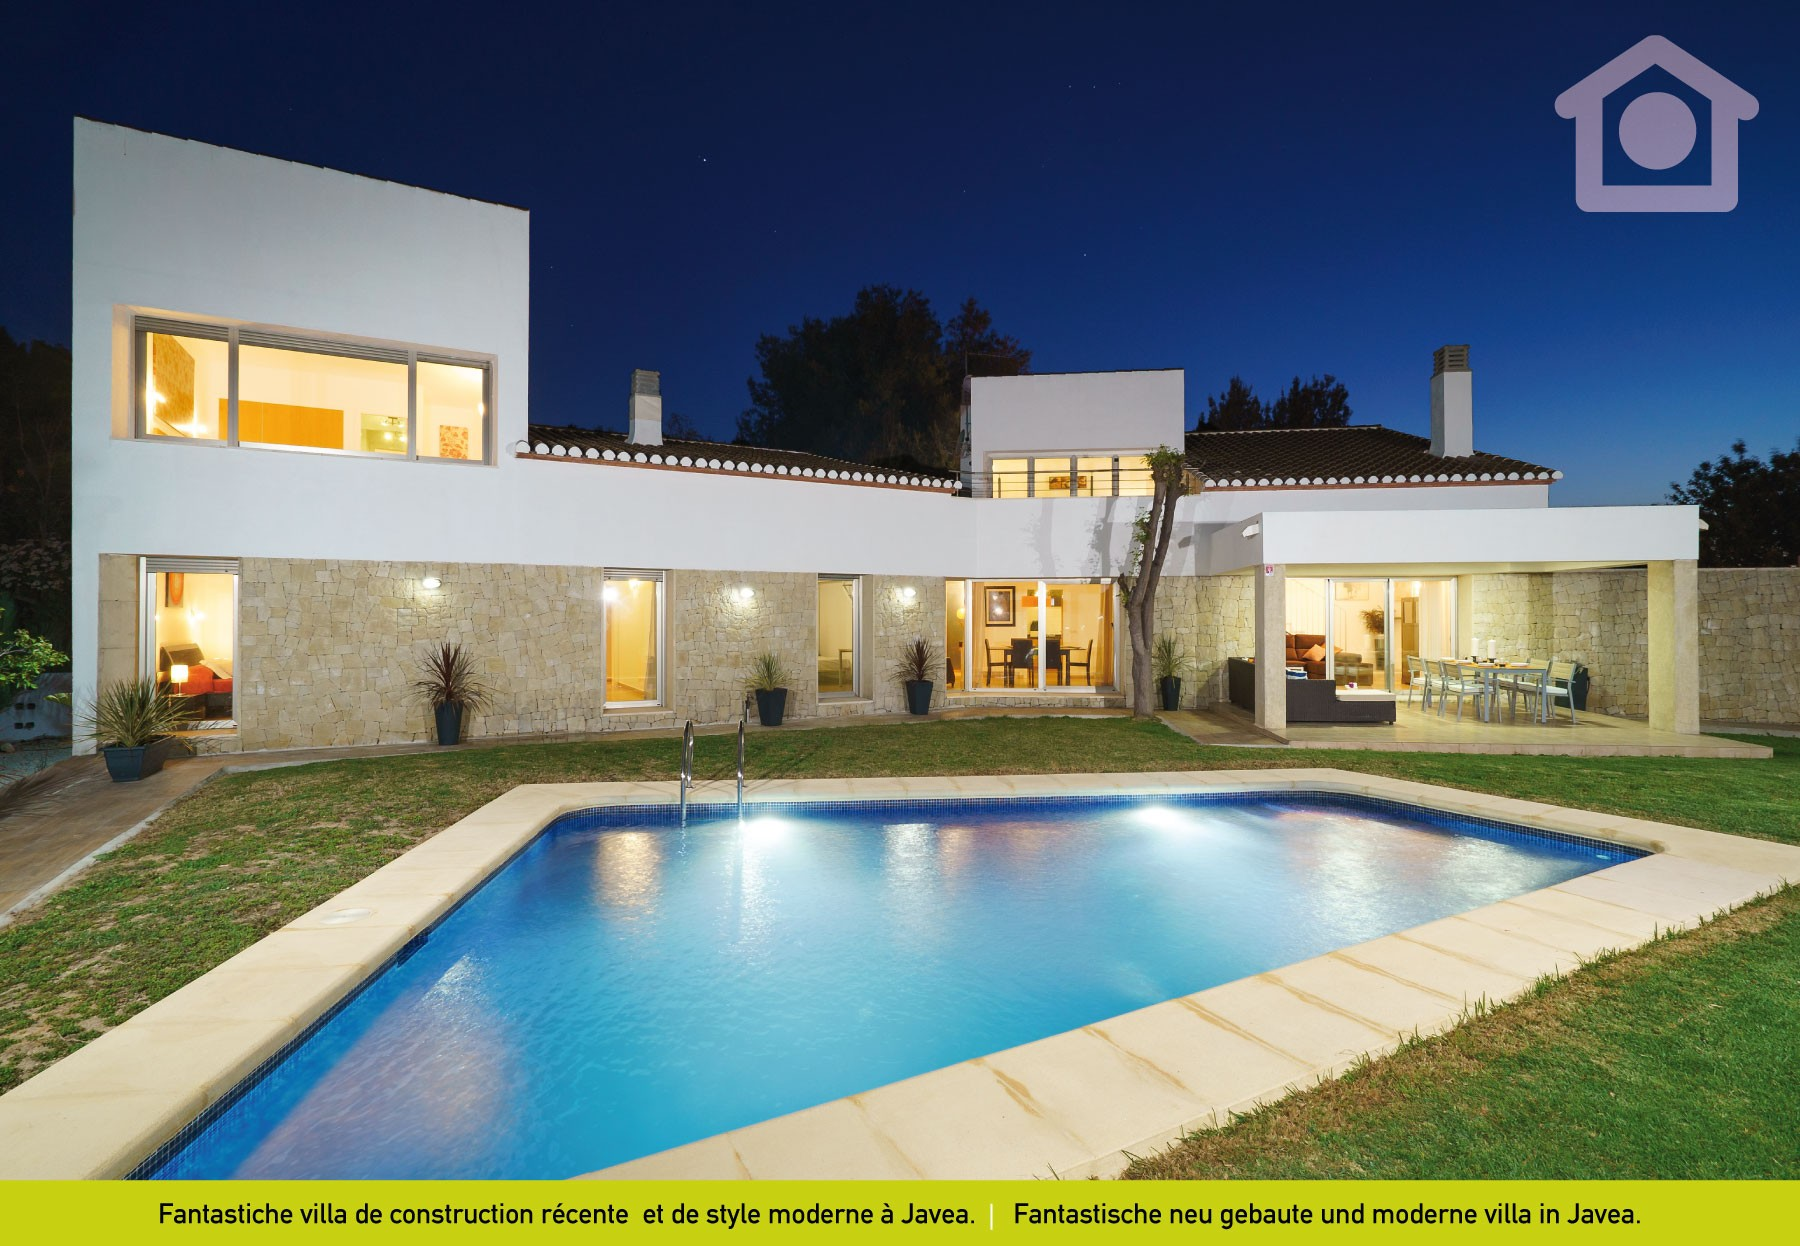 Casa de vacaciones costa blanca javea espa a jewel for Casa moderna javea